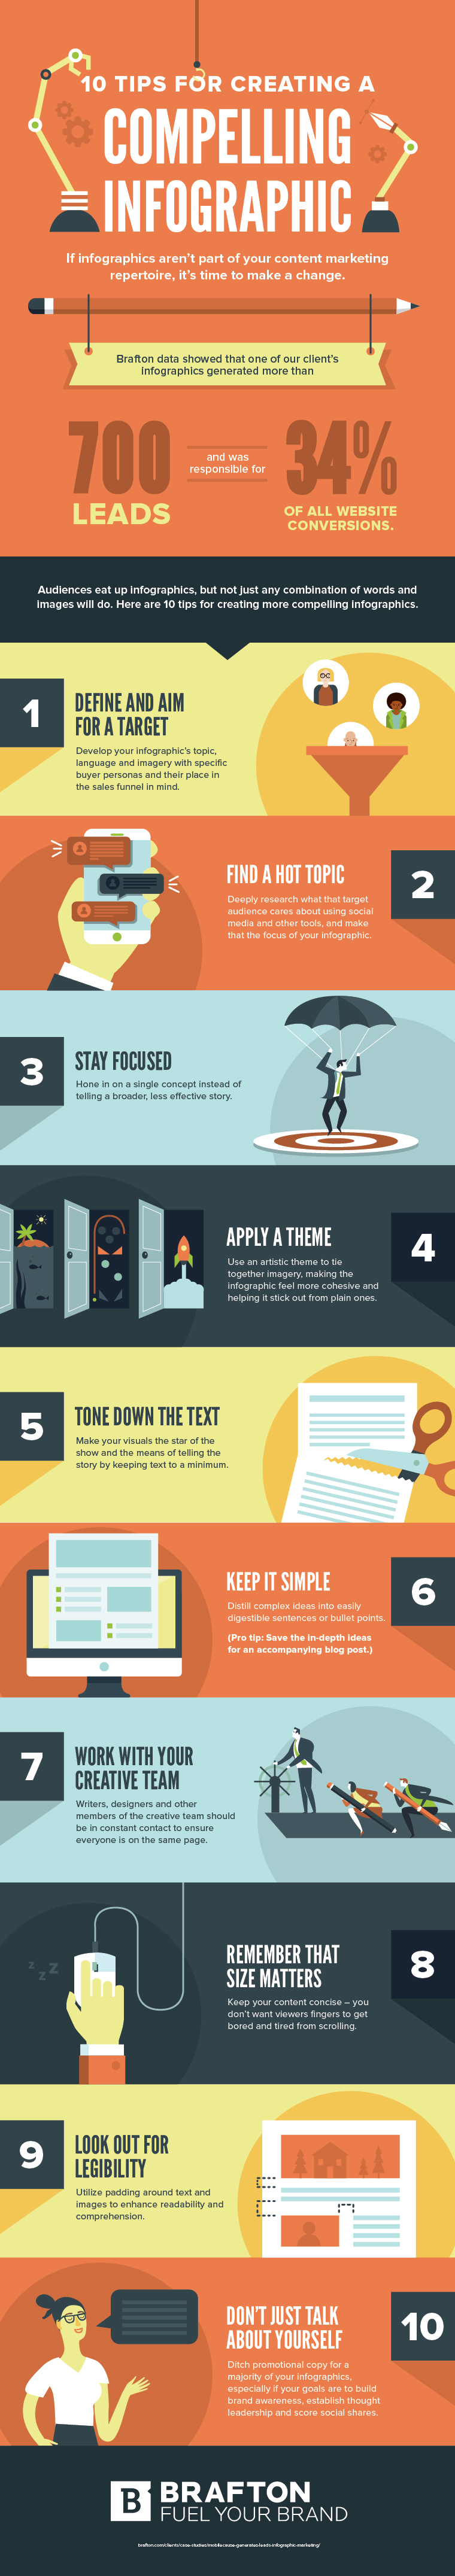 Brafton PG Compelling Infographic-01.jpg